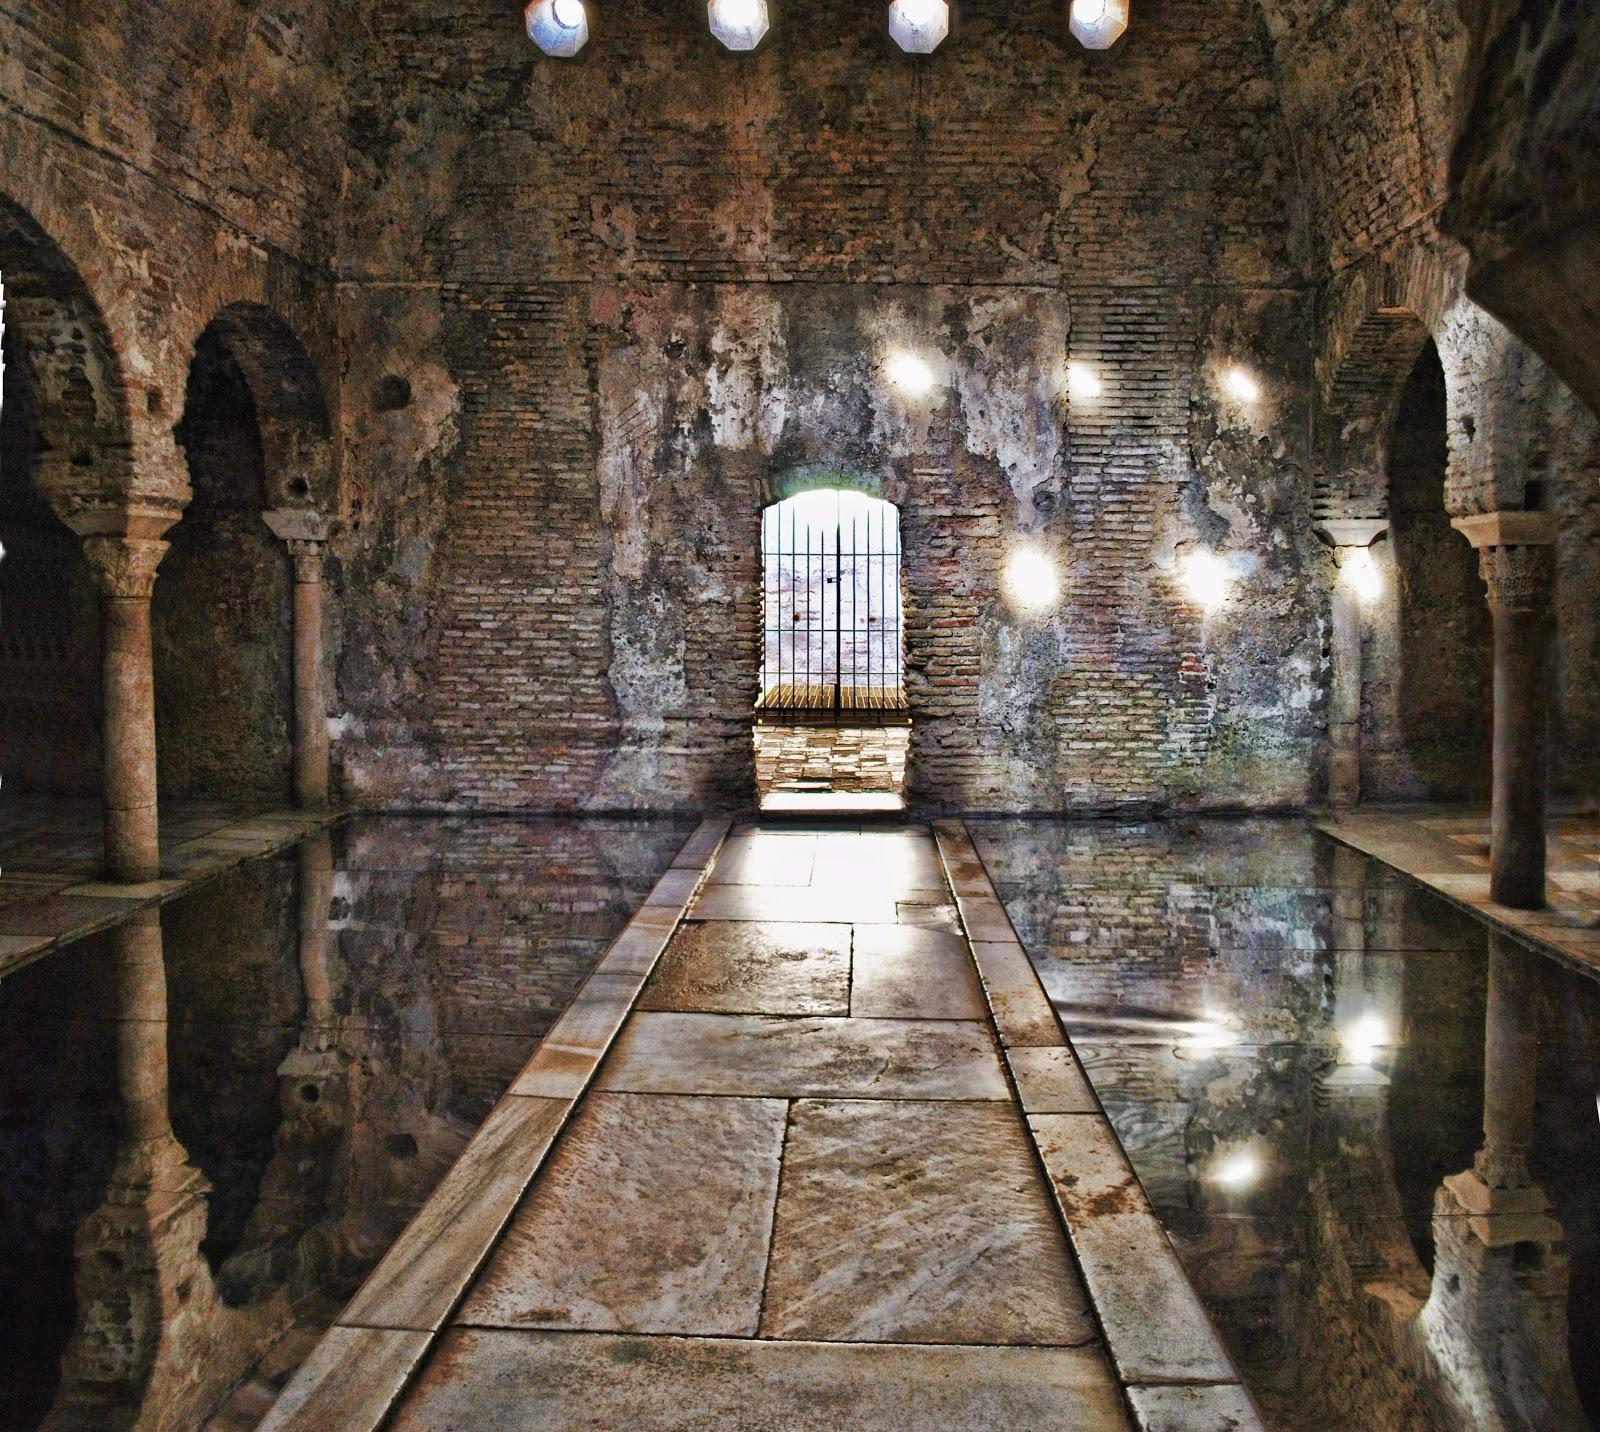 Baño Arabe Hammam Granada:GRANADA: HAMMAM EL BAÑUELO